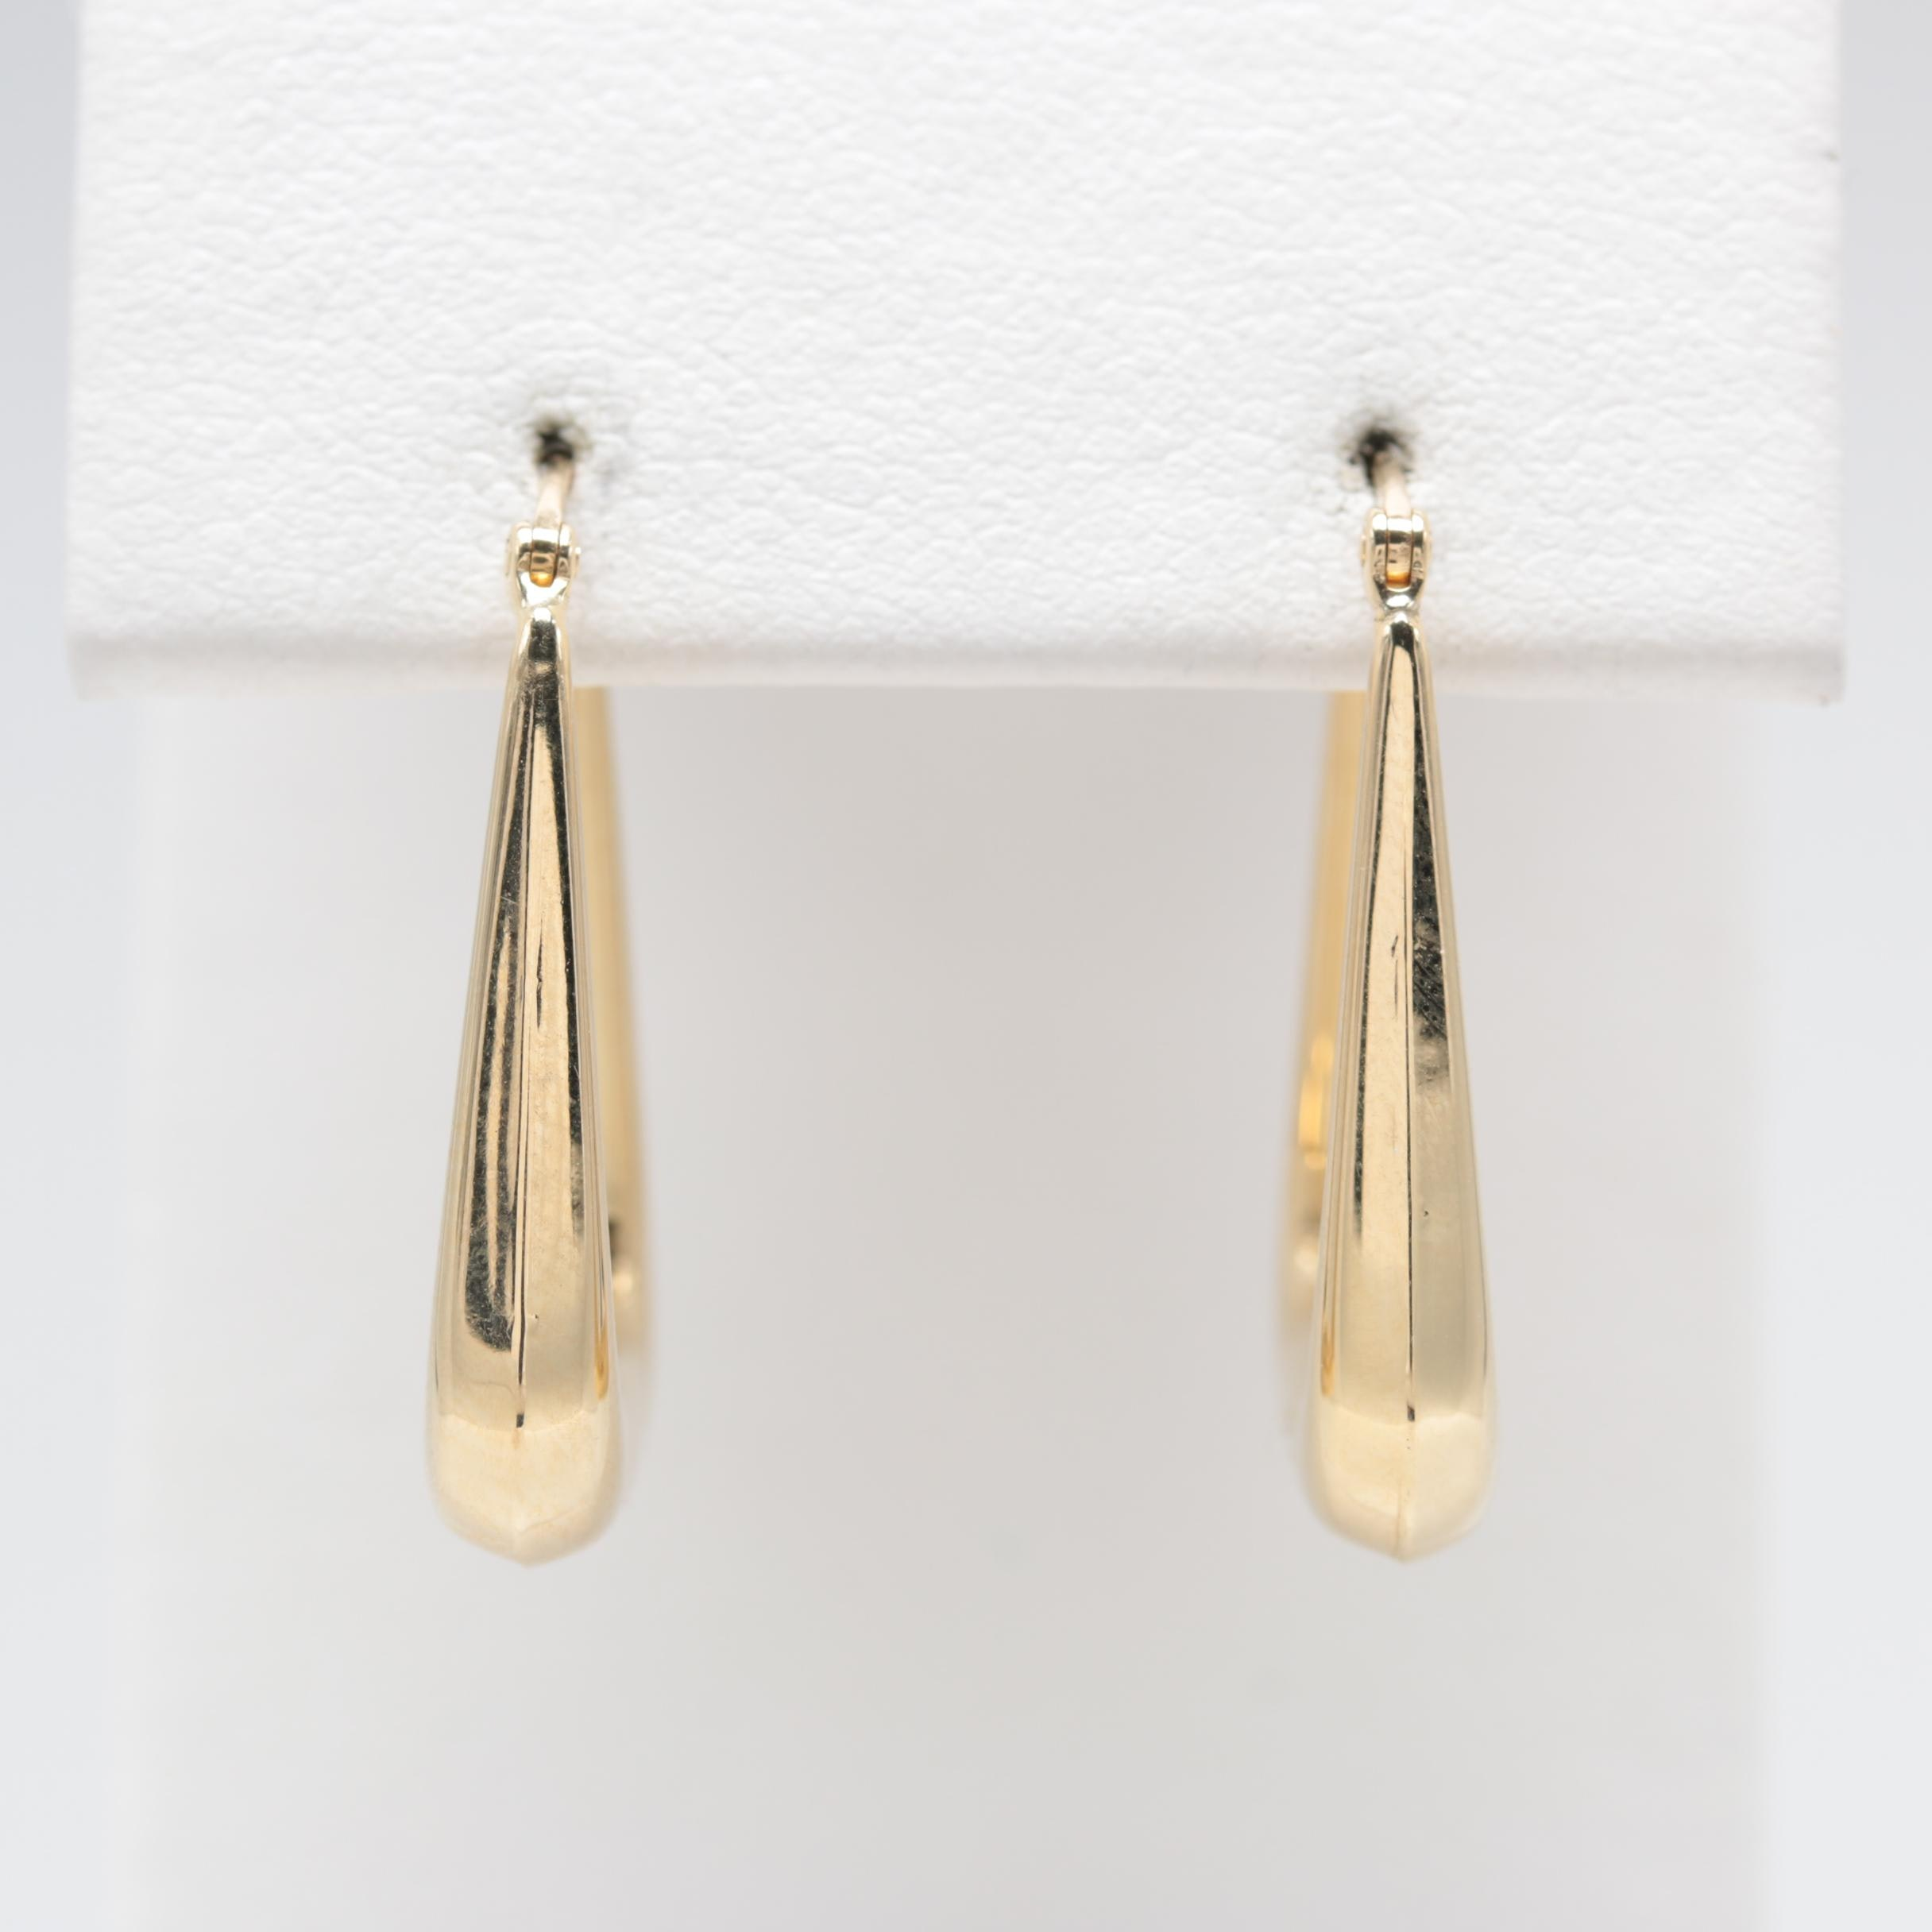 14K Yellow Gold Squared Hoop Earrings